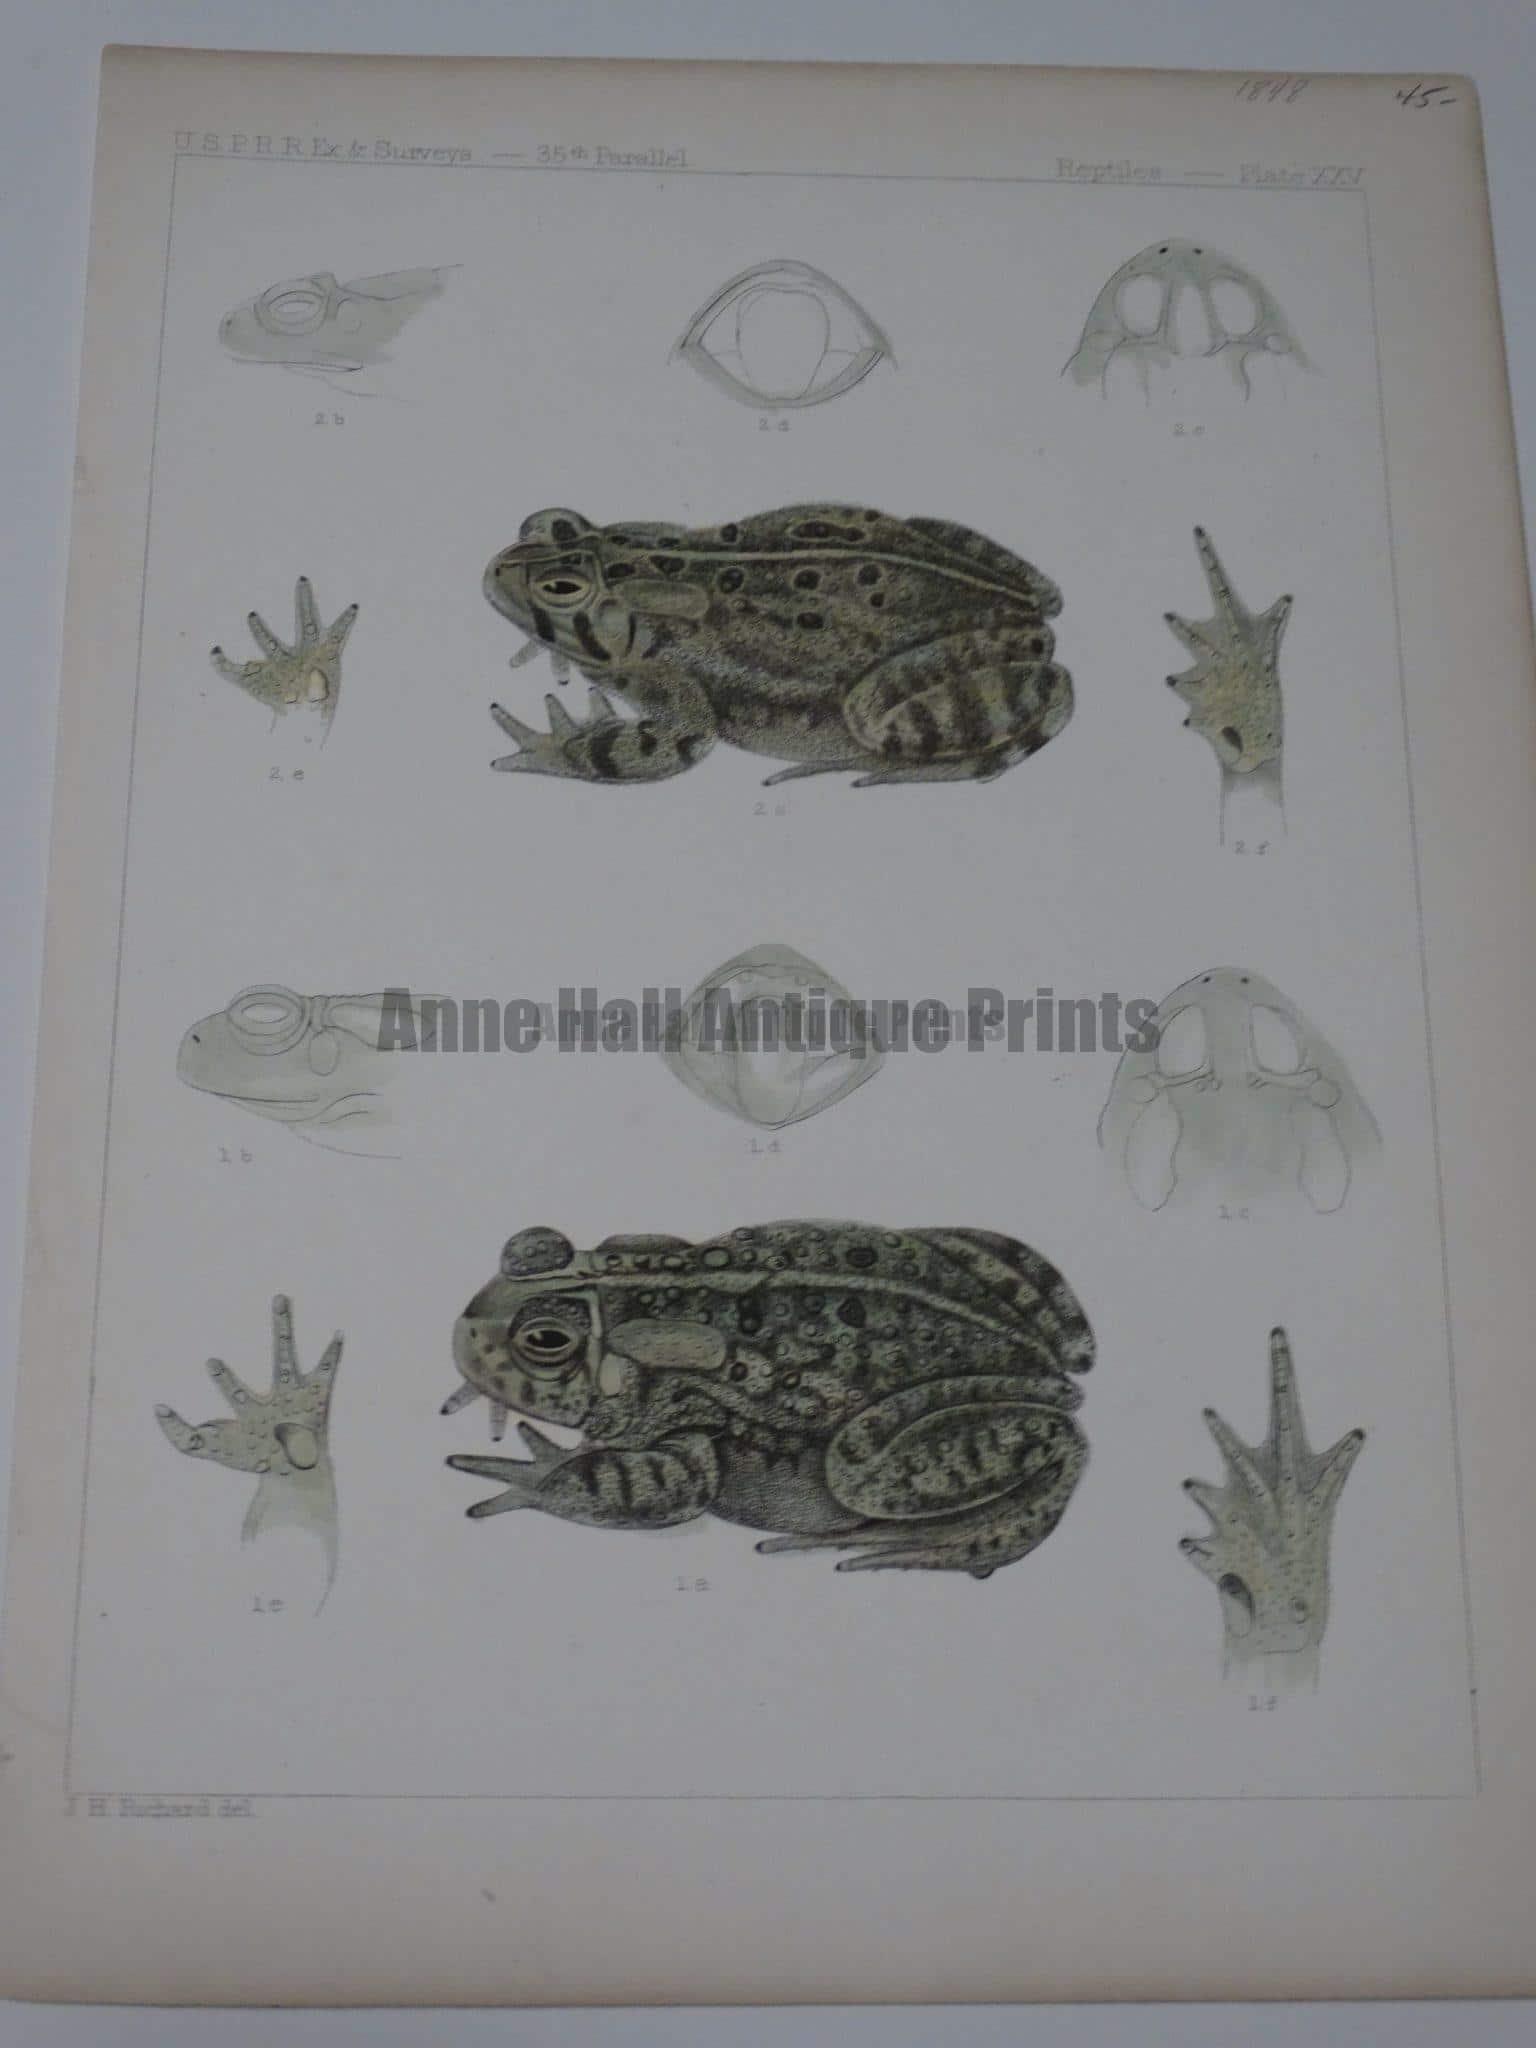 USPRR Frogs Plate XXV $45.